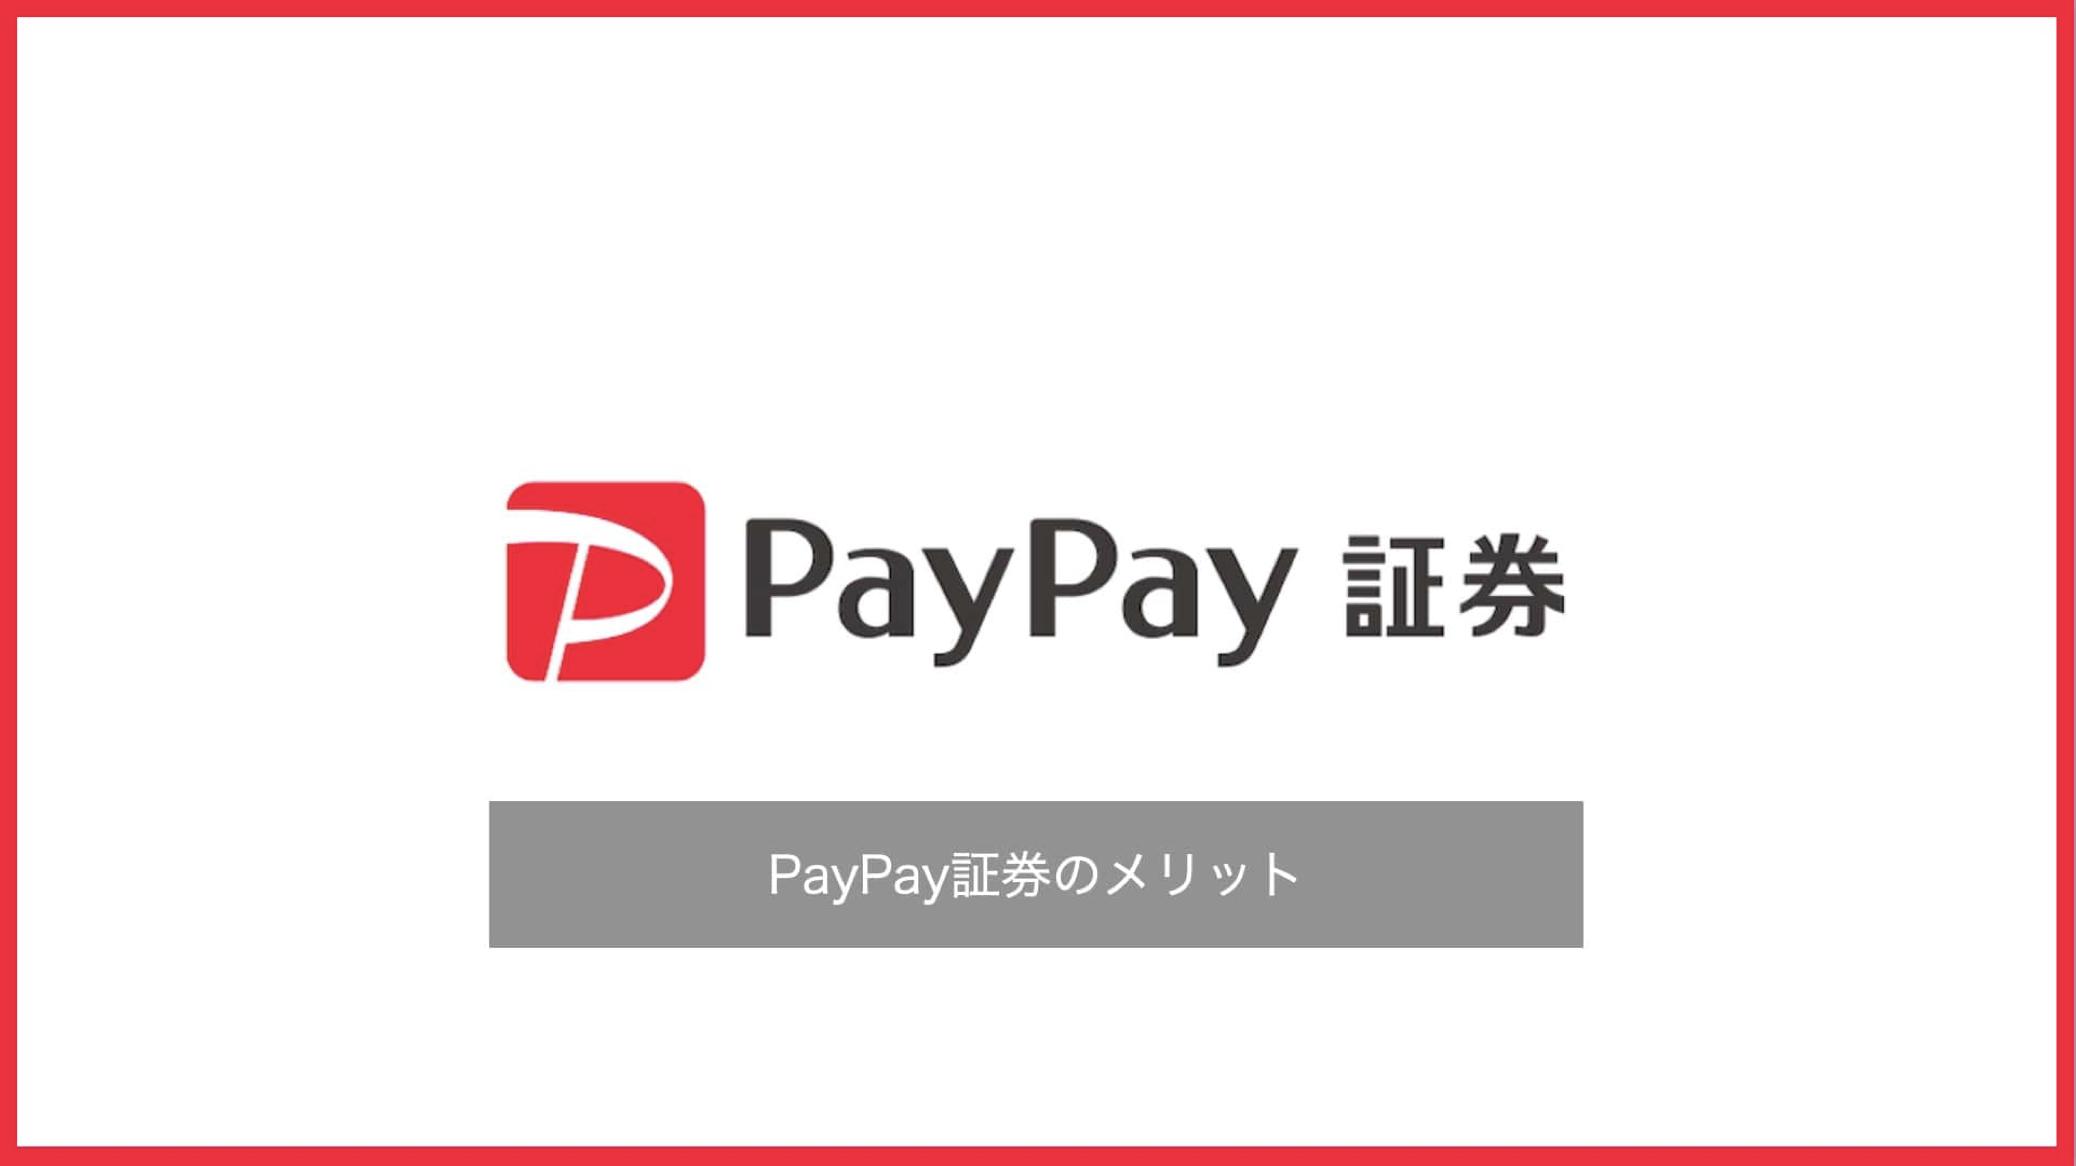 PayPay証券の評判と実際使ってわかったメリット・デメリットをレビュー